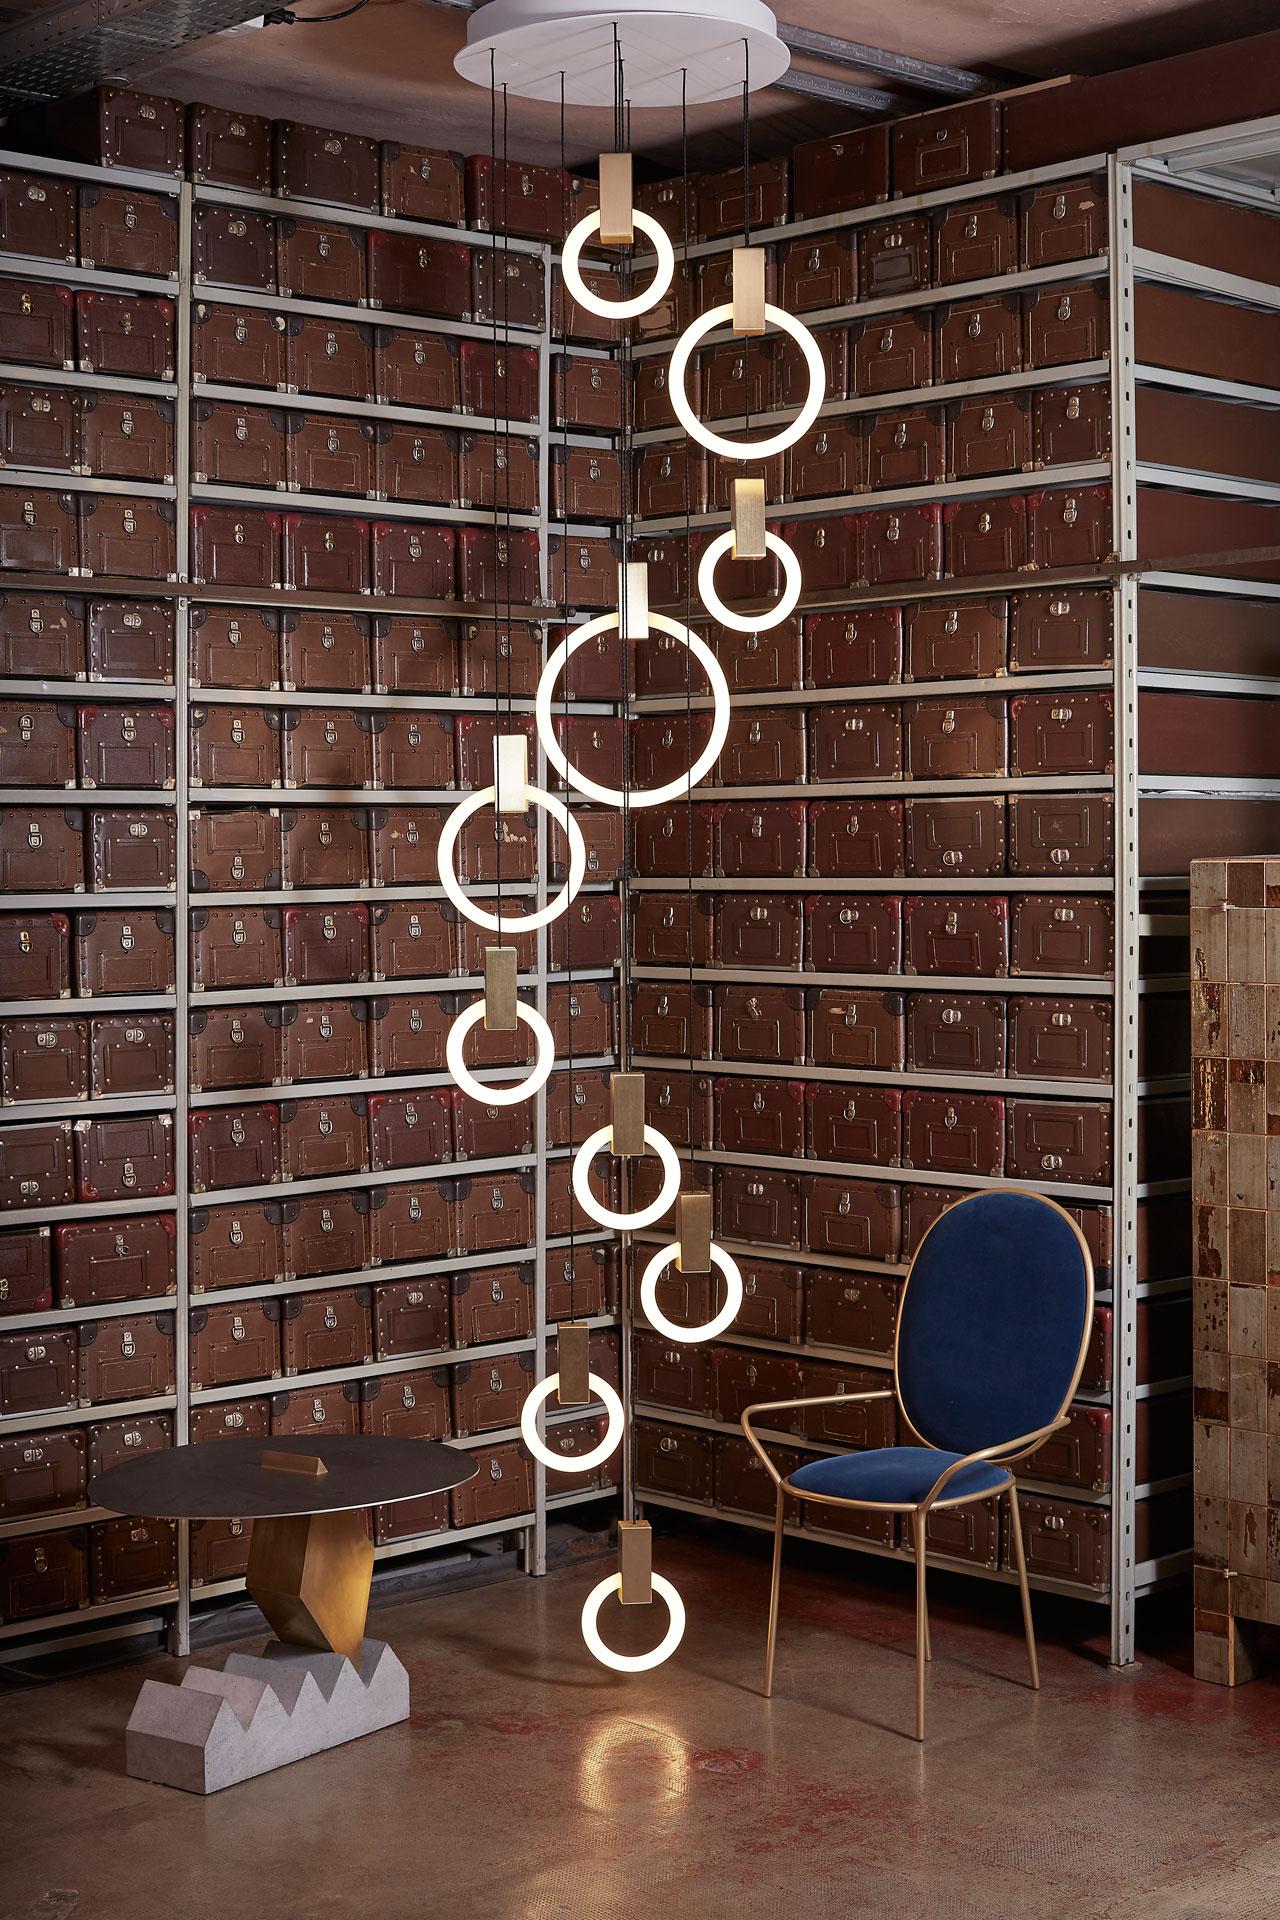 Installation with HALO lights byCanadian designer Matthew McCormick at Spazio Rossana Orlandi.